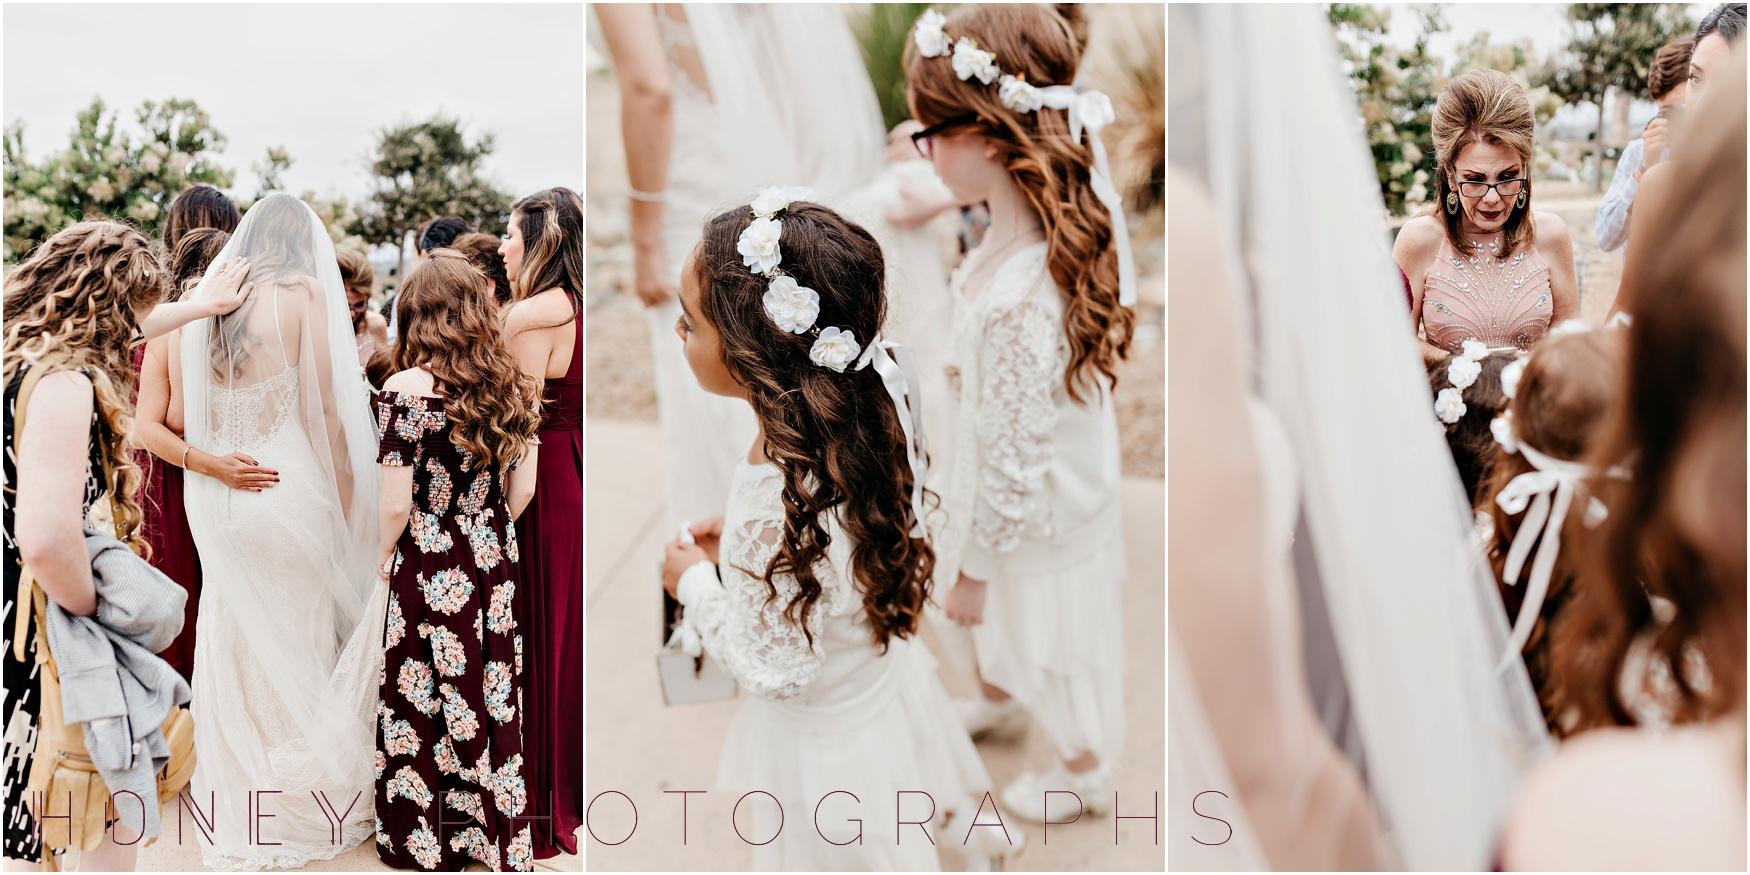 garden-classic-burgundy-jewel-tone-luxury-pacific-event-oceanside-wedding18.jpg